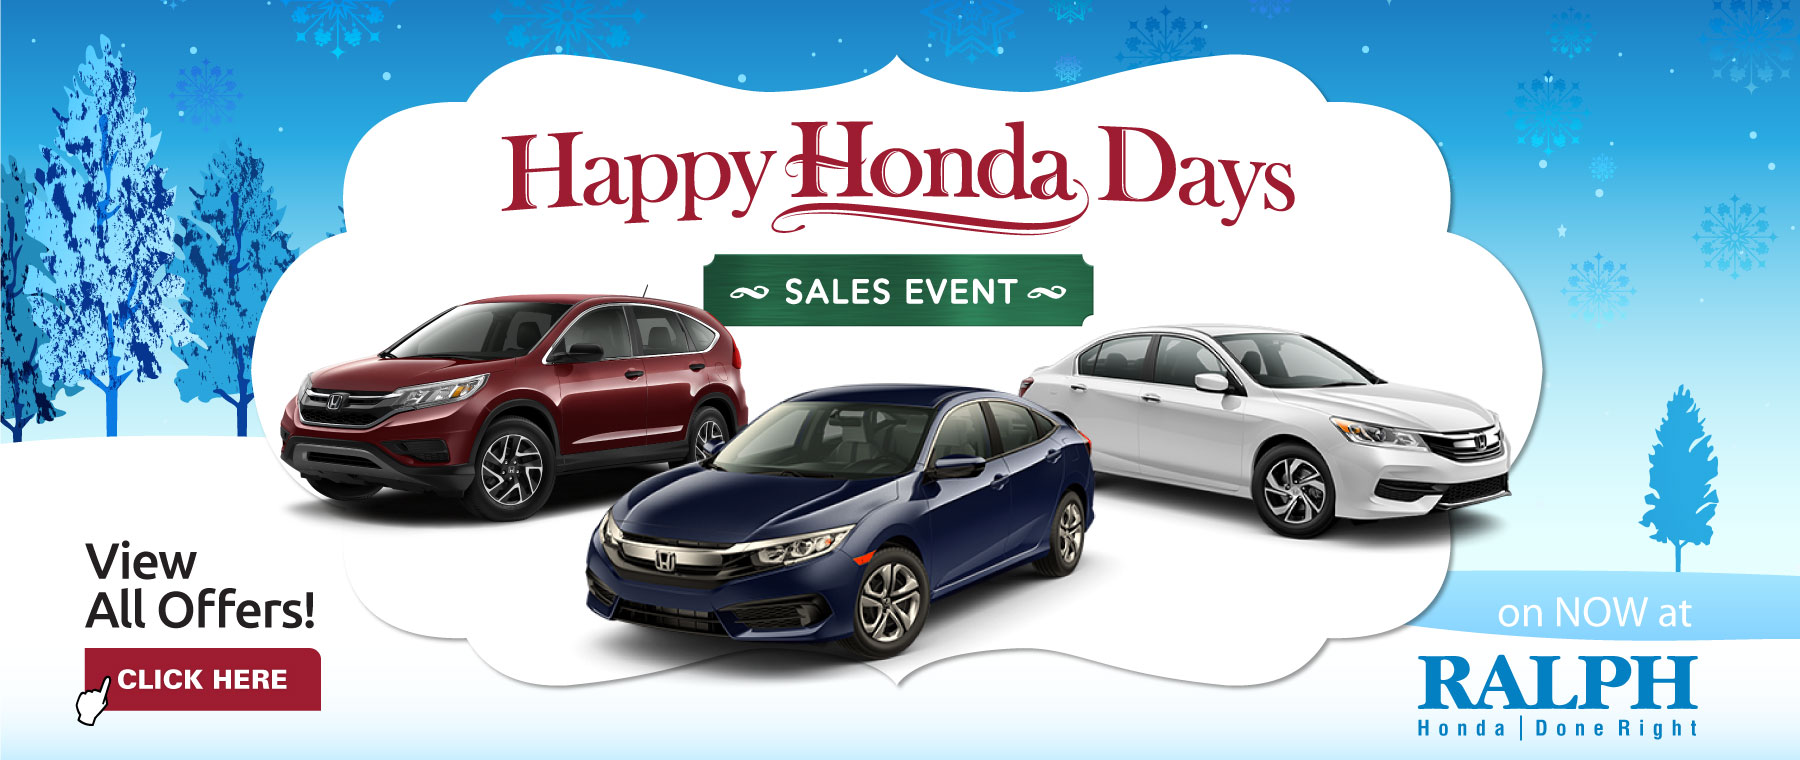 Honda used car dealer in rochester ny ralph honda for Honda dealer ny